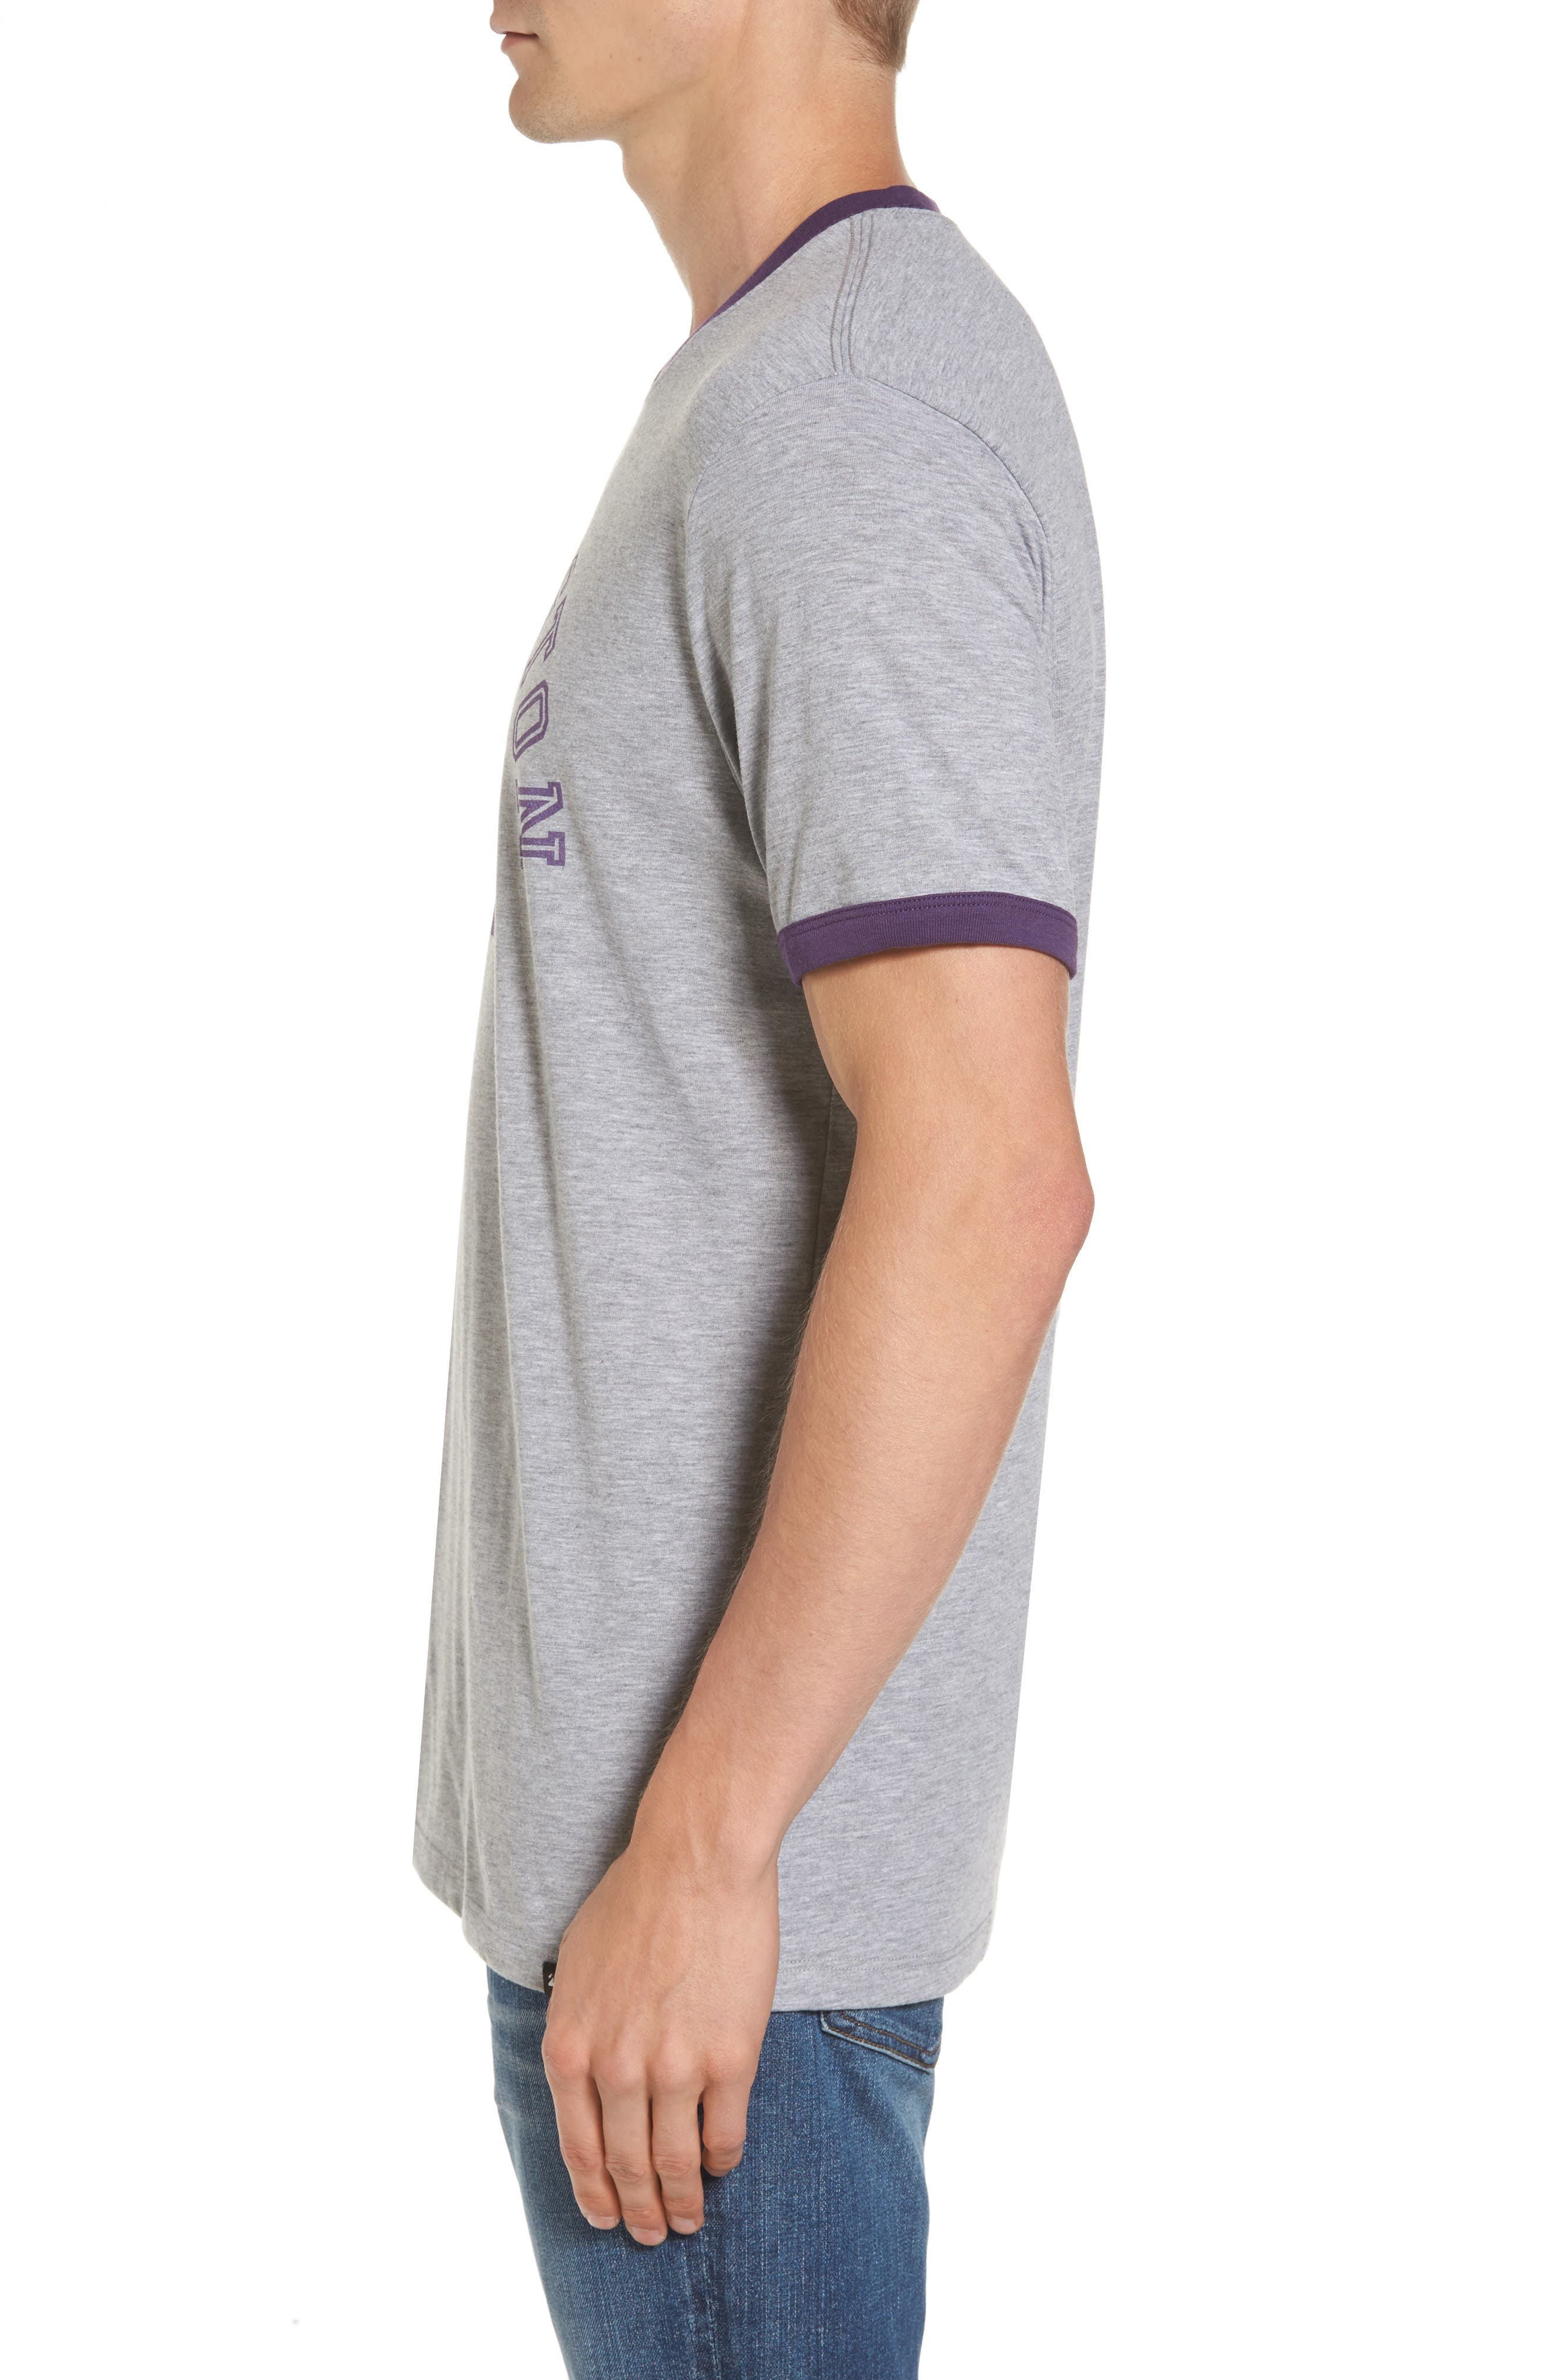 University of Washington Huskies Ringer T-Shirt,                             Alternate thumbnail 3, color,                             020